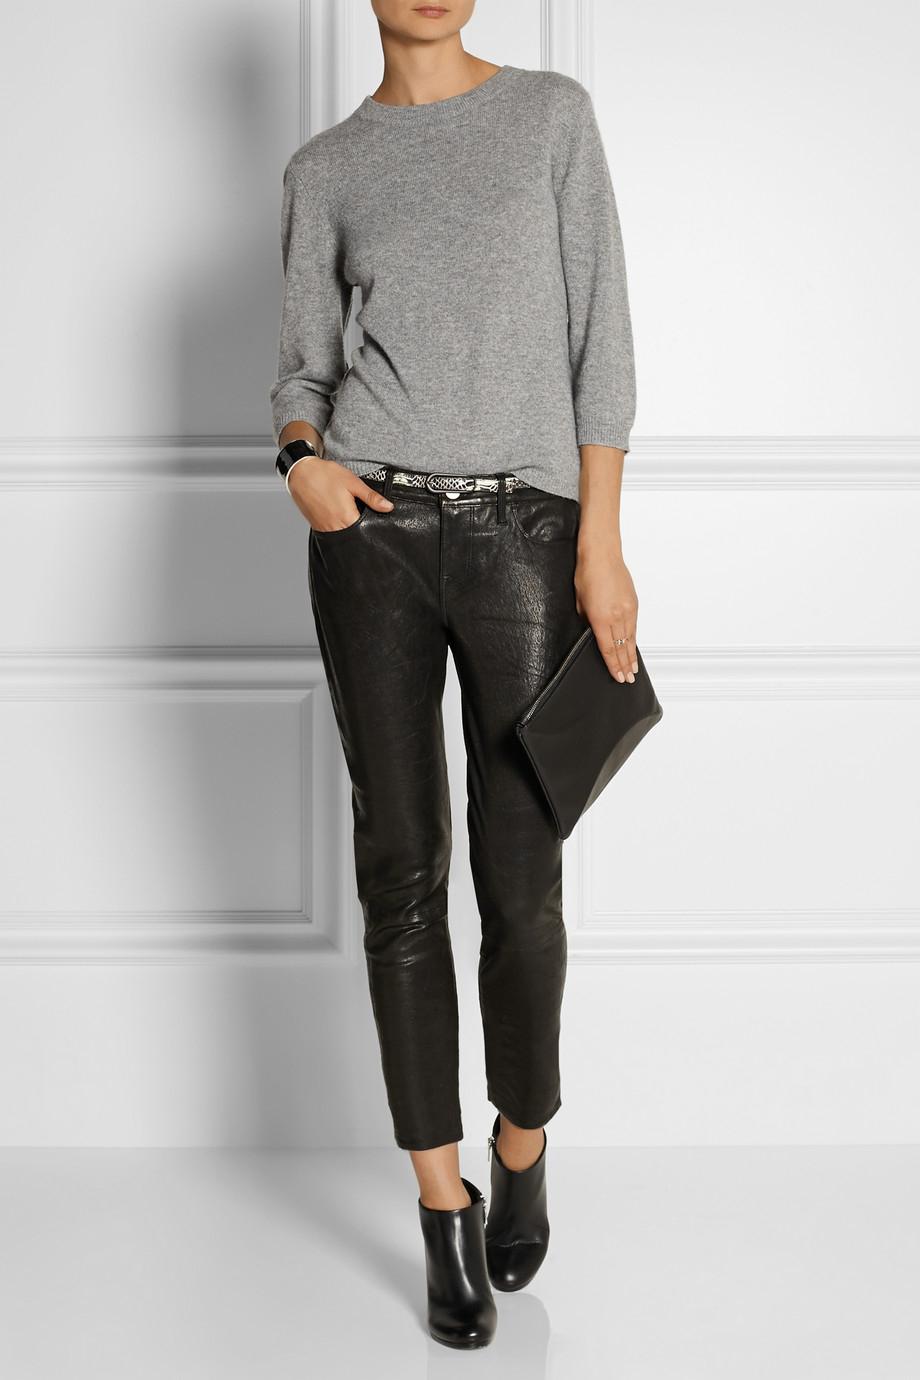 Frame Le Garcon Textured Leather Slim Boyfriend Pants In